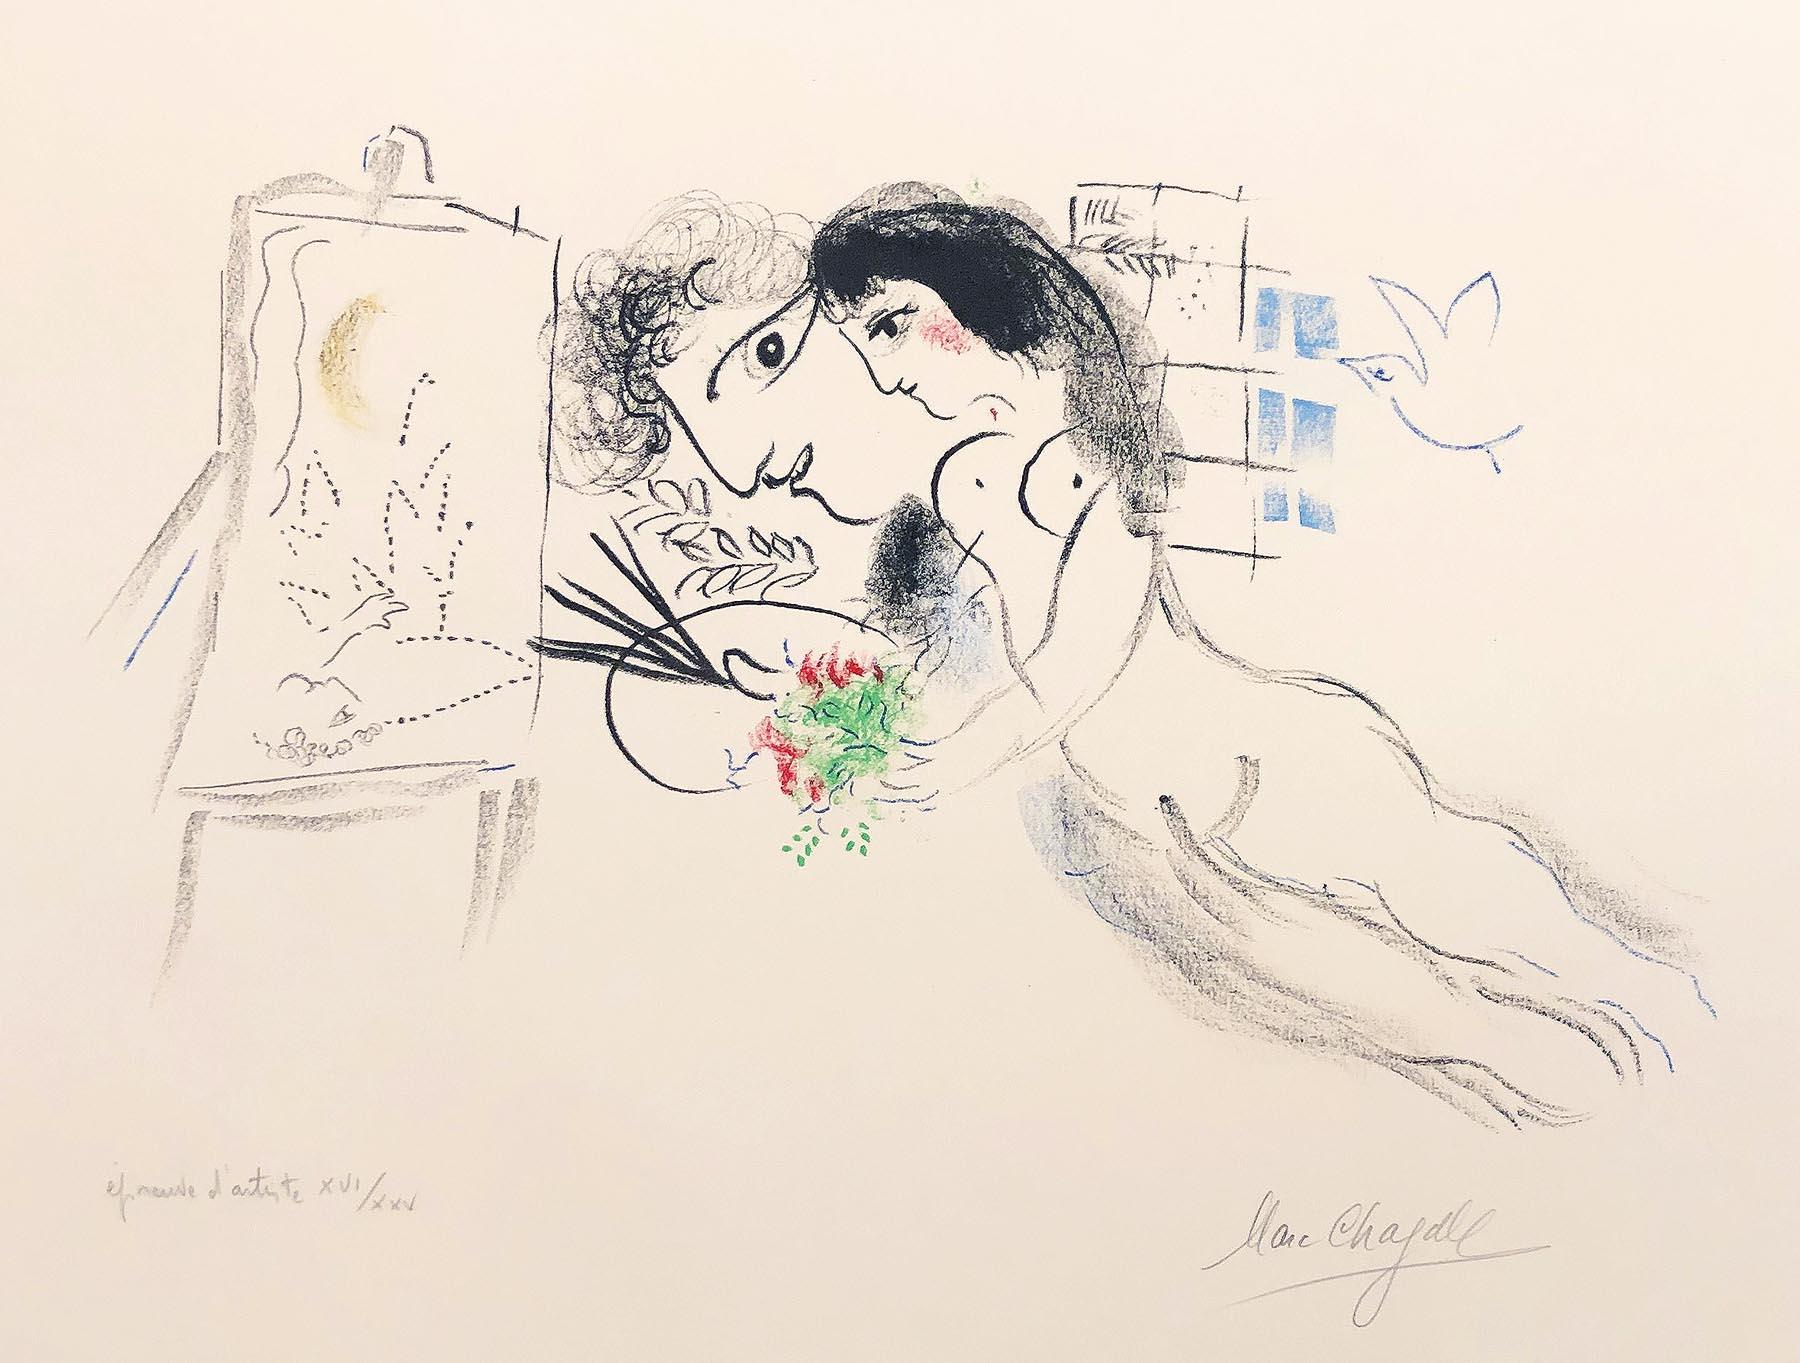 Rêve Familiar by Marc Chagall